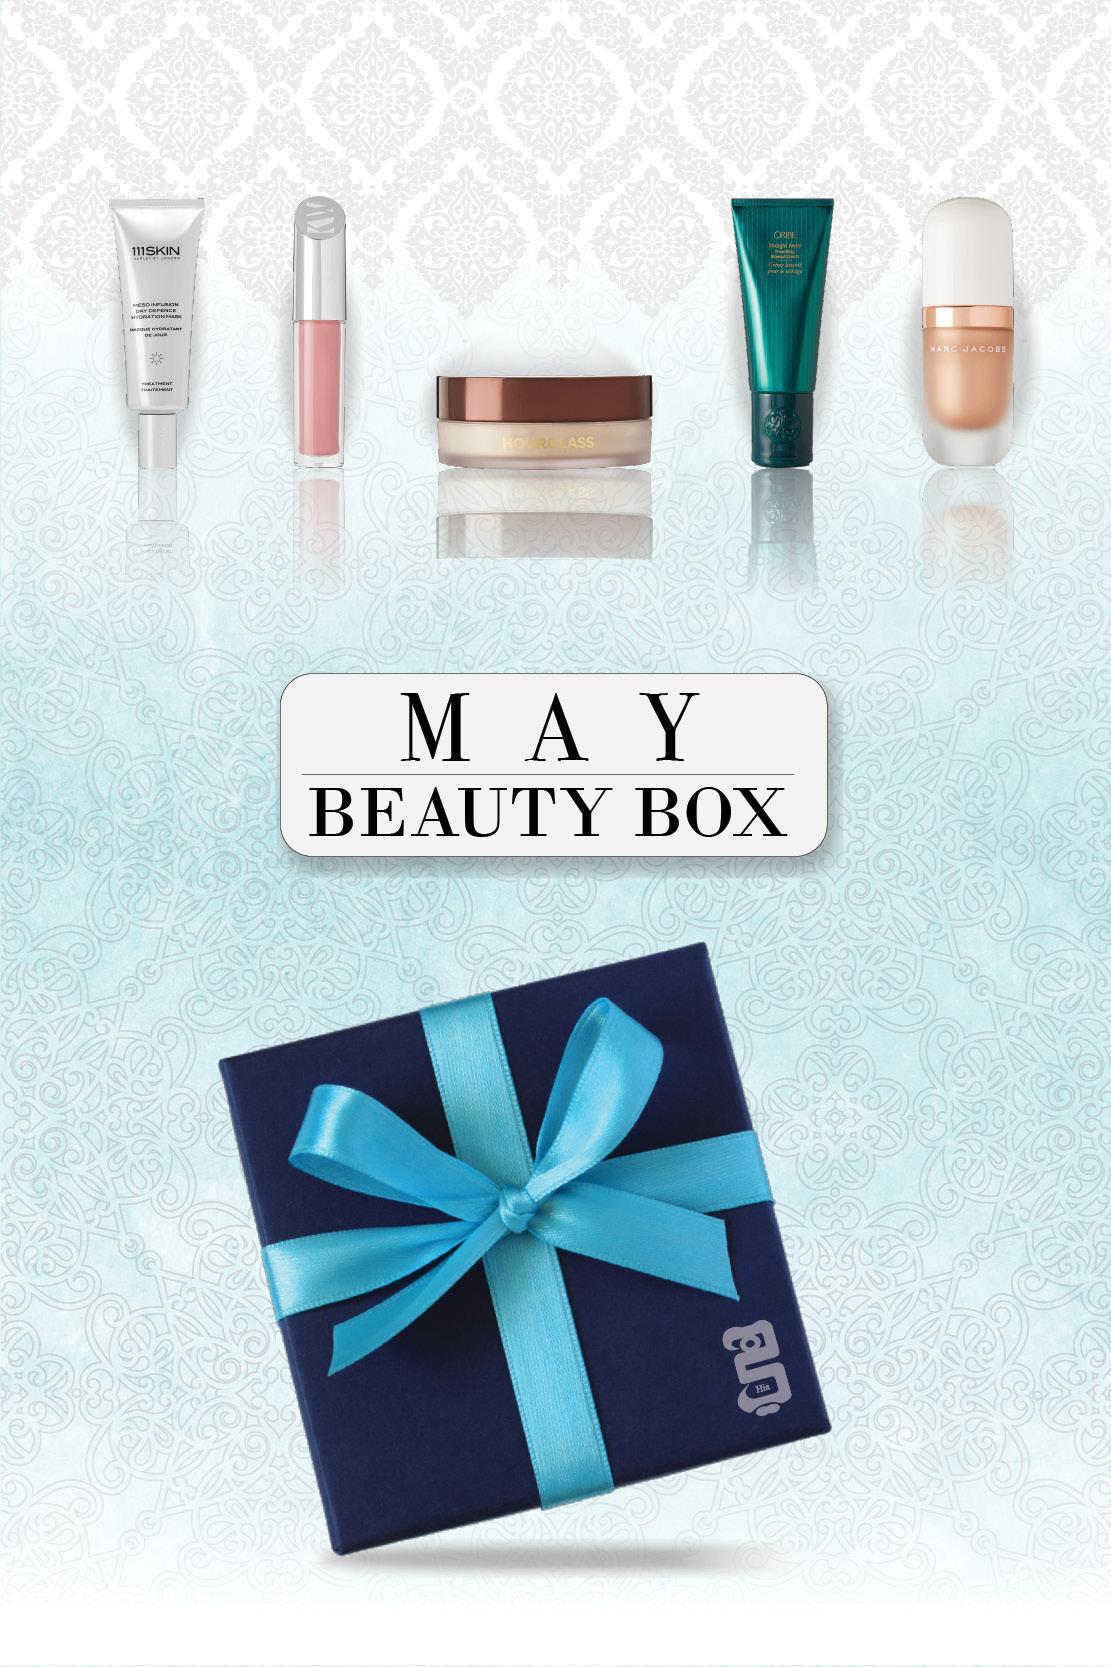 Beauty Box  شهر مايو... أجدد المستحضرات الجمالية لرمضان